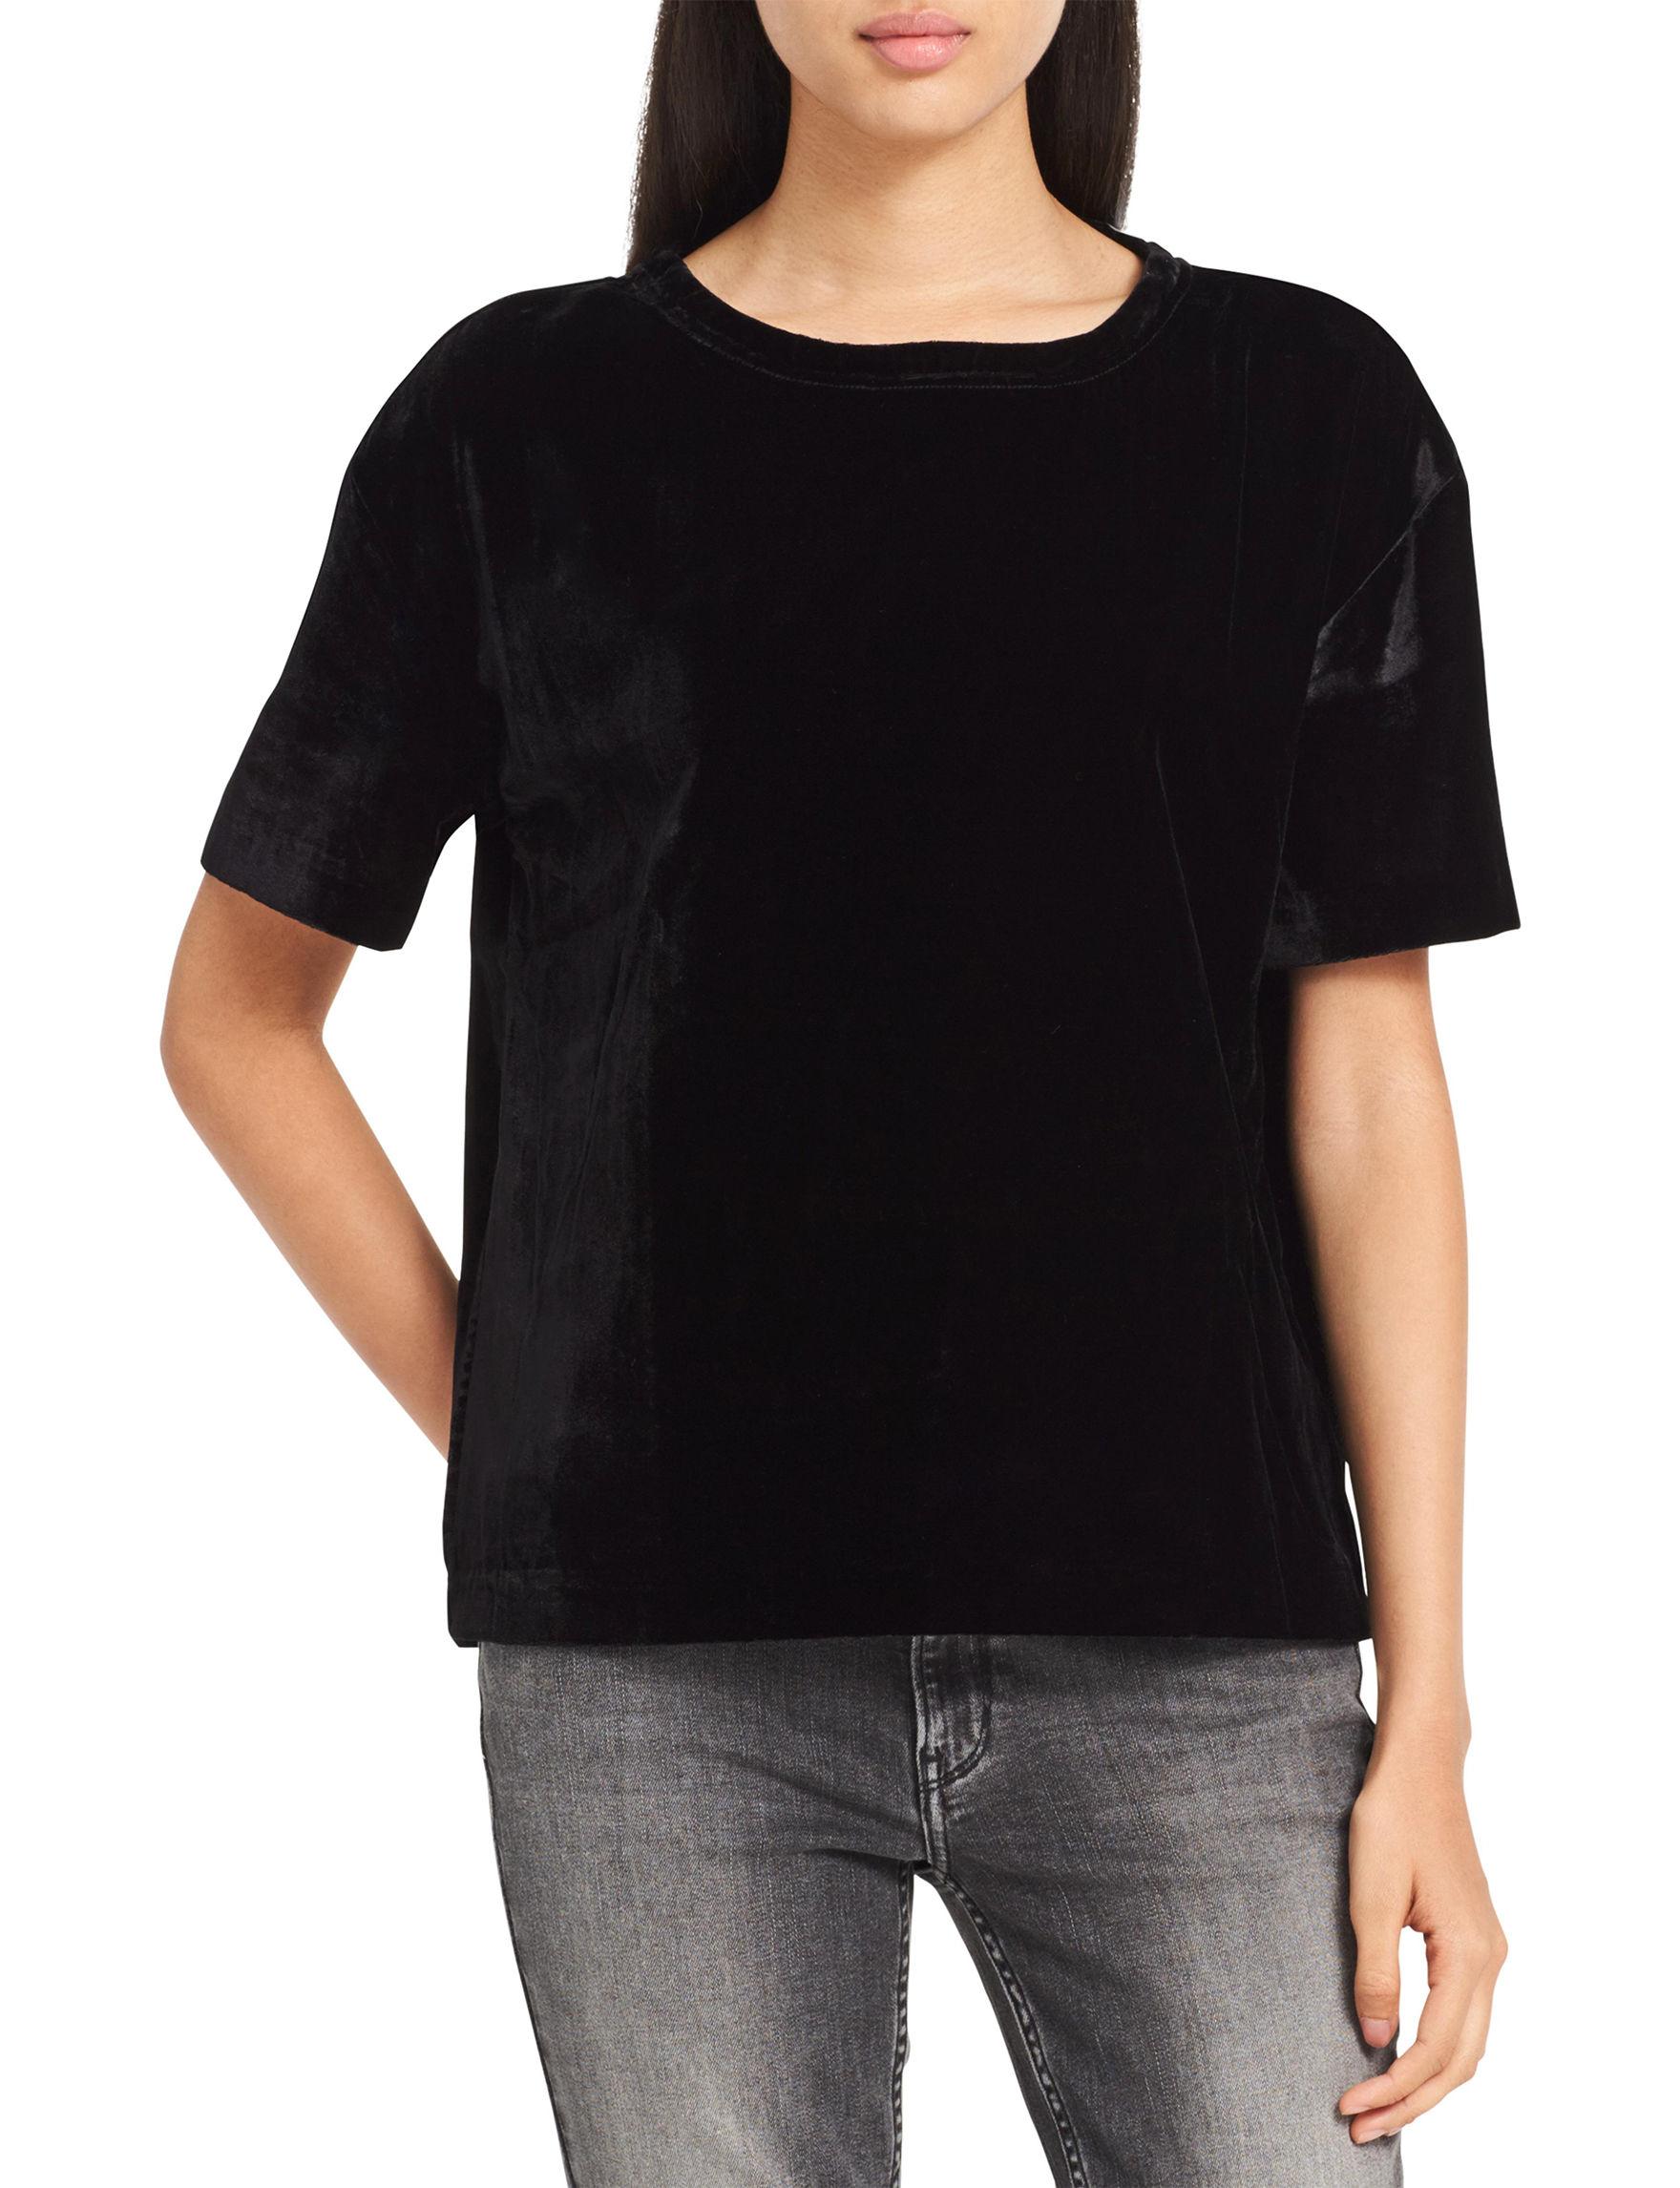 Calvin Klein Jeans Black Tees & Tanks